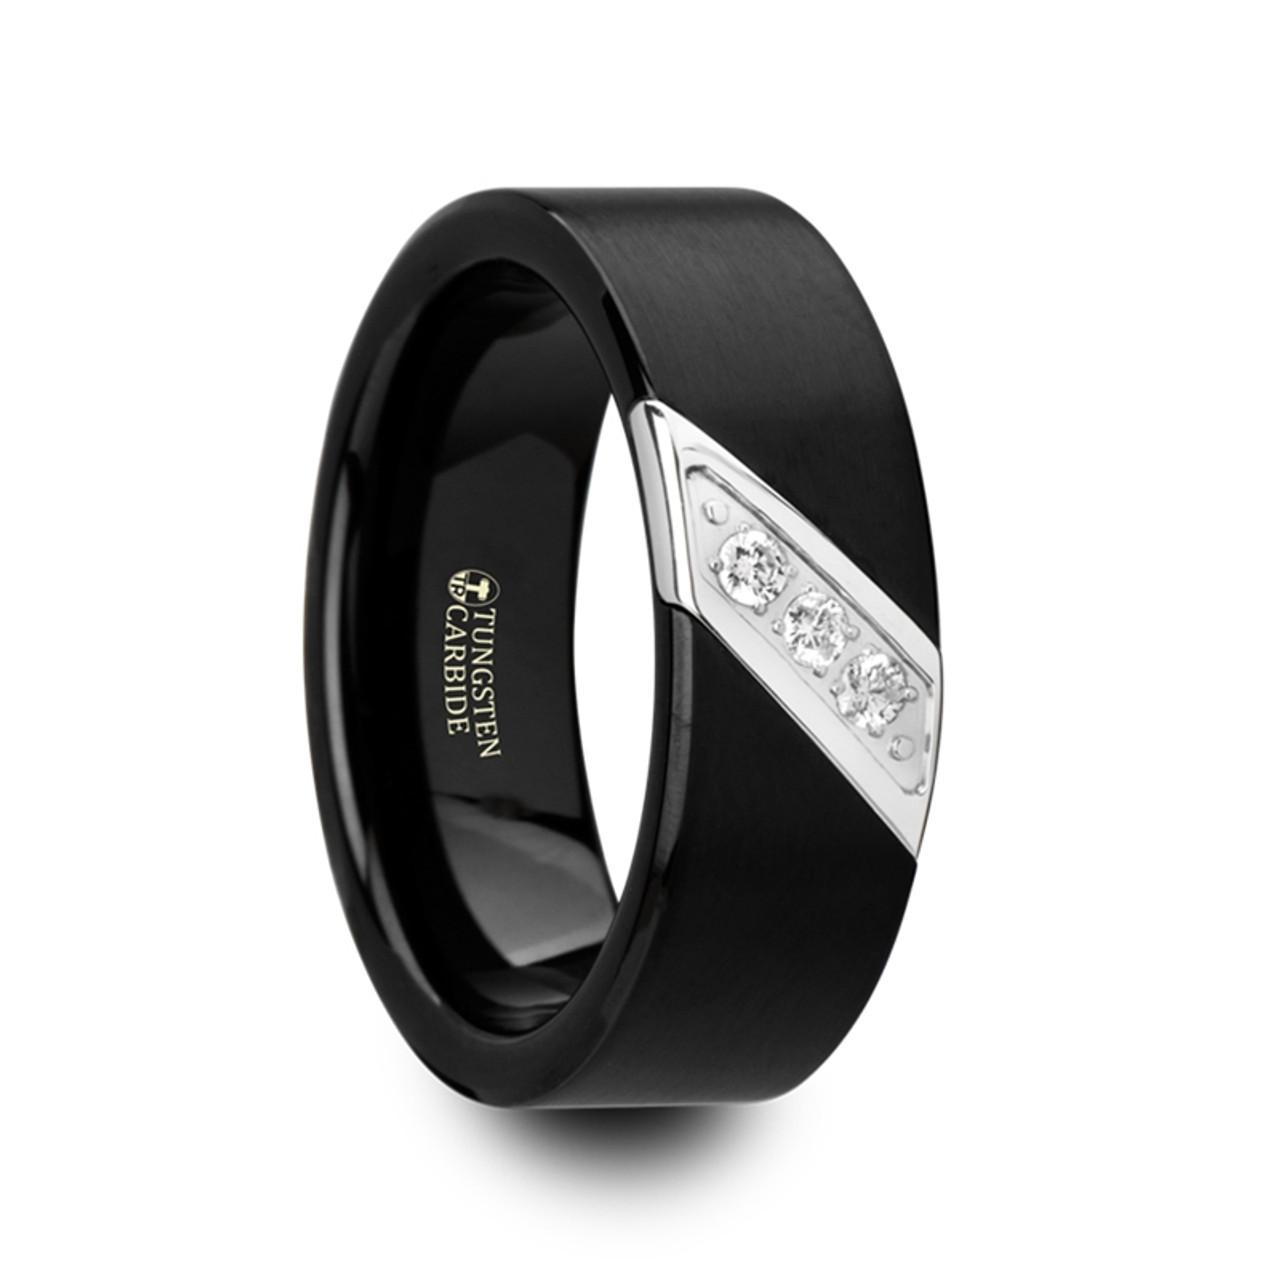 8 Mm Black Tungsten With Diamond Band L284tr